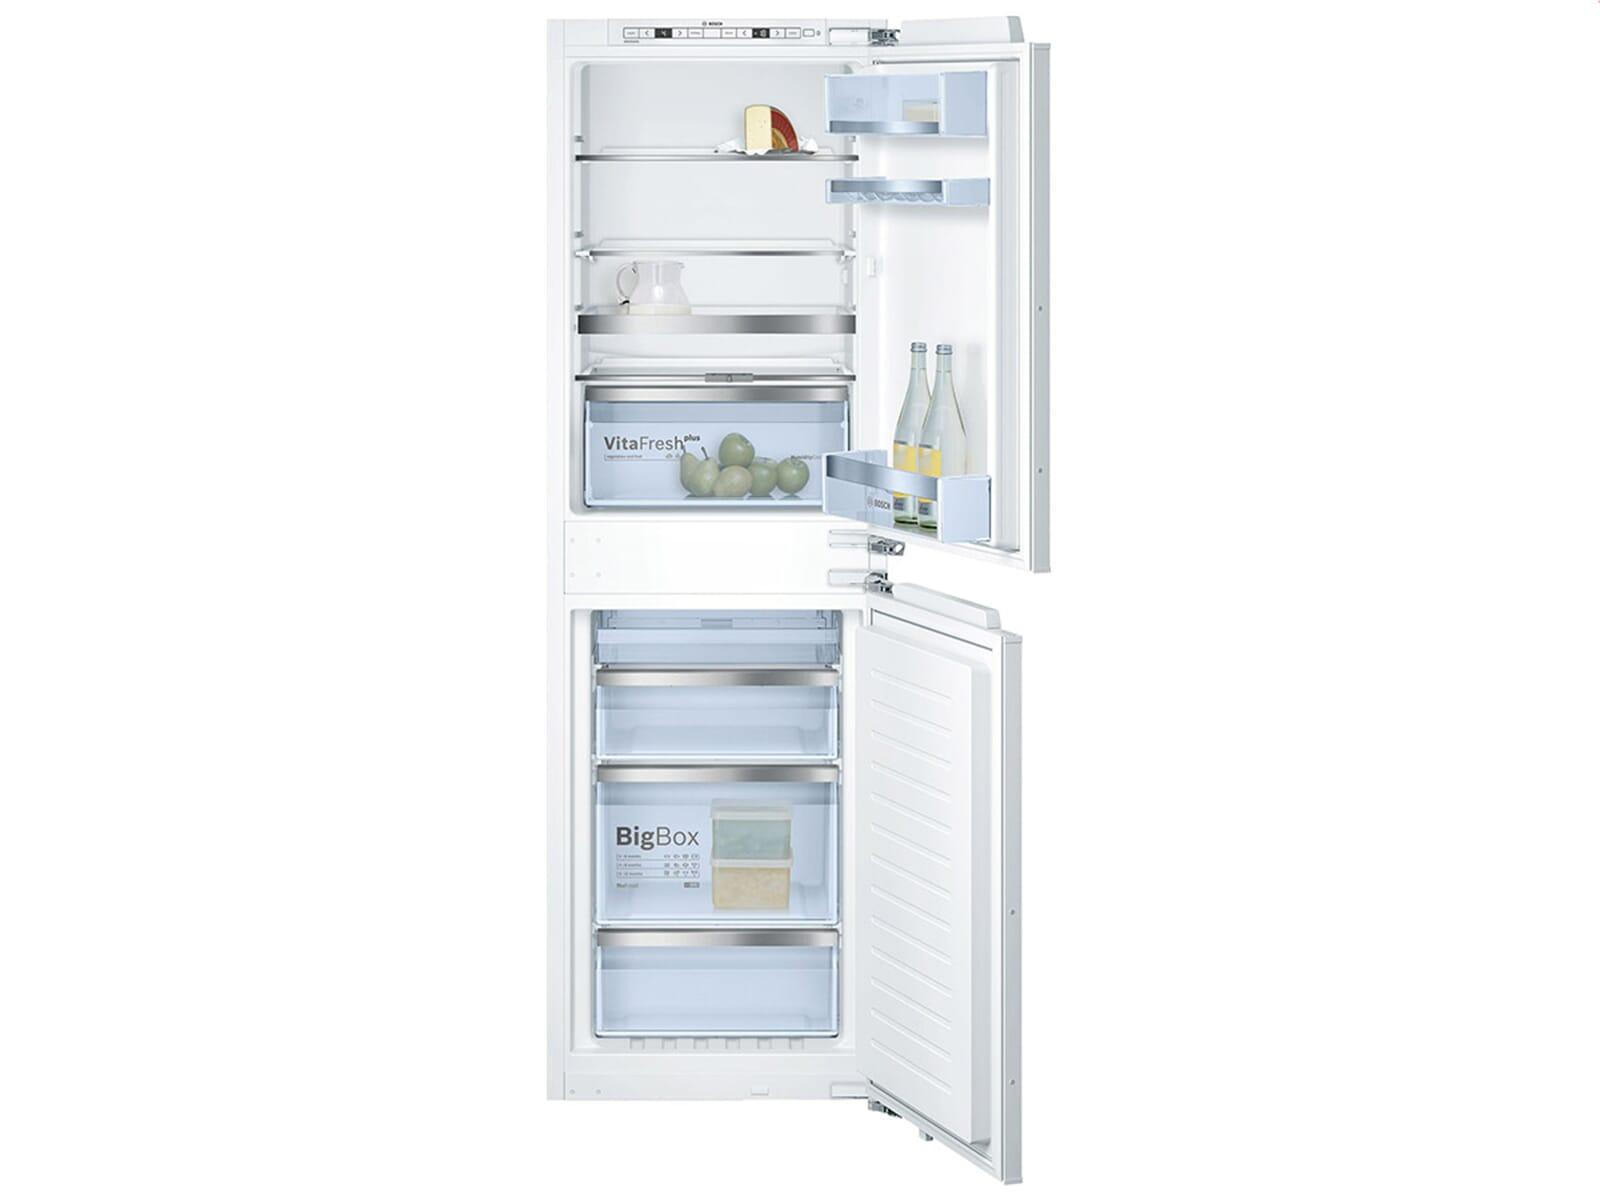 Aeg Kühlschrank Vitafresh : Aeg einbau kühlschrank gefrierkombination kühl